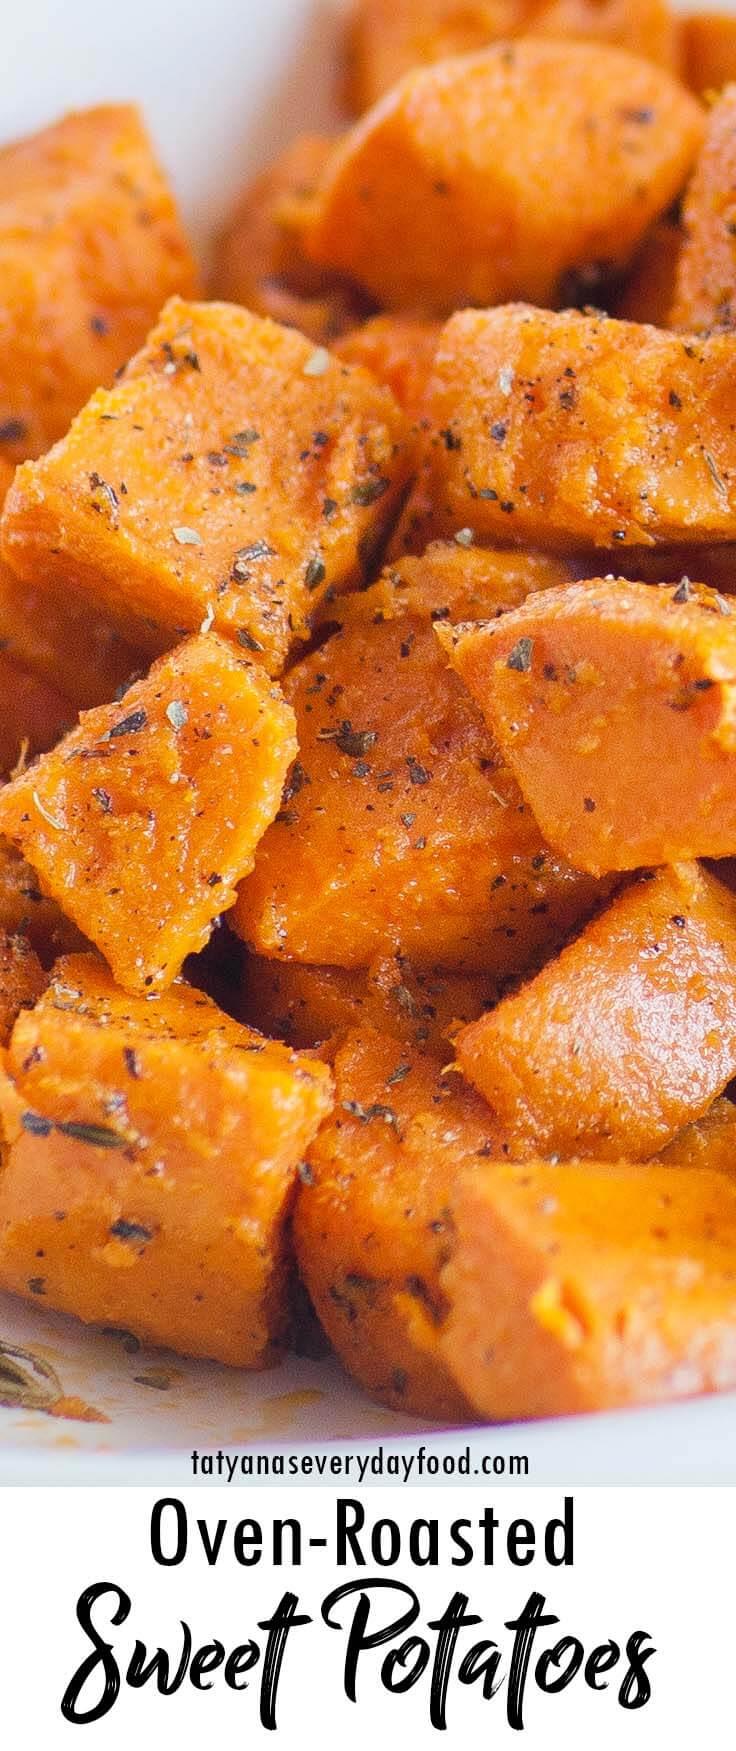 Oven Roasted Sweet Potatoes video recipe